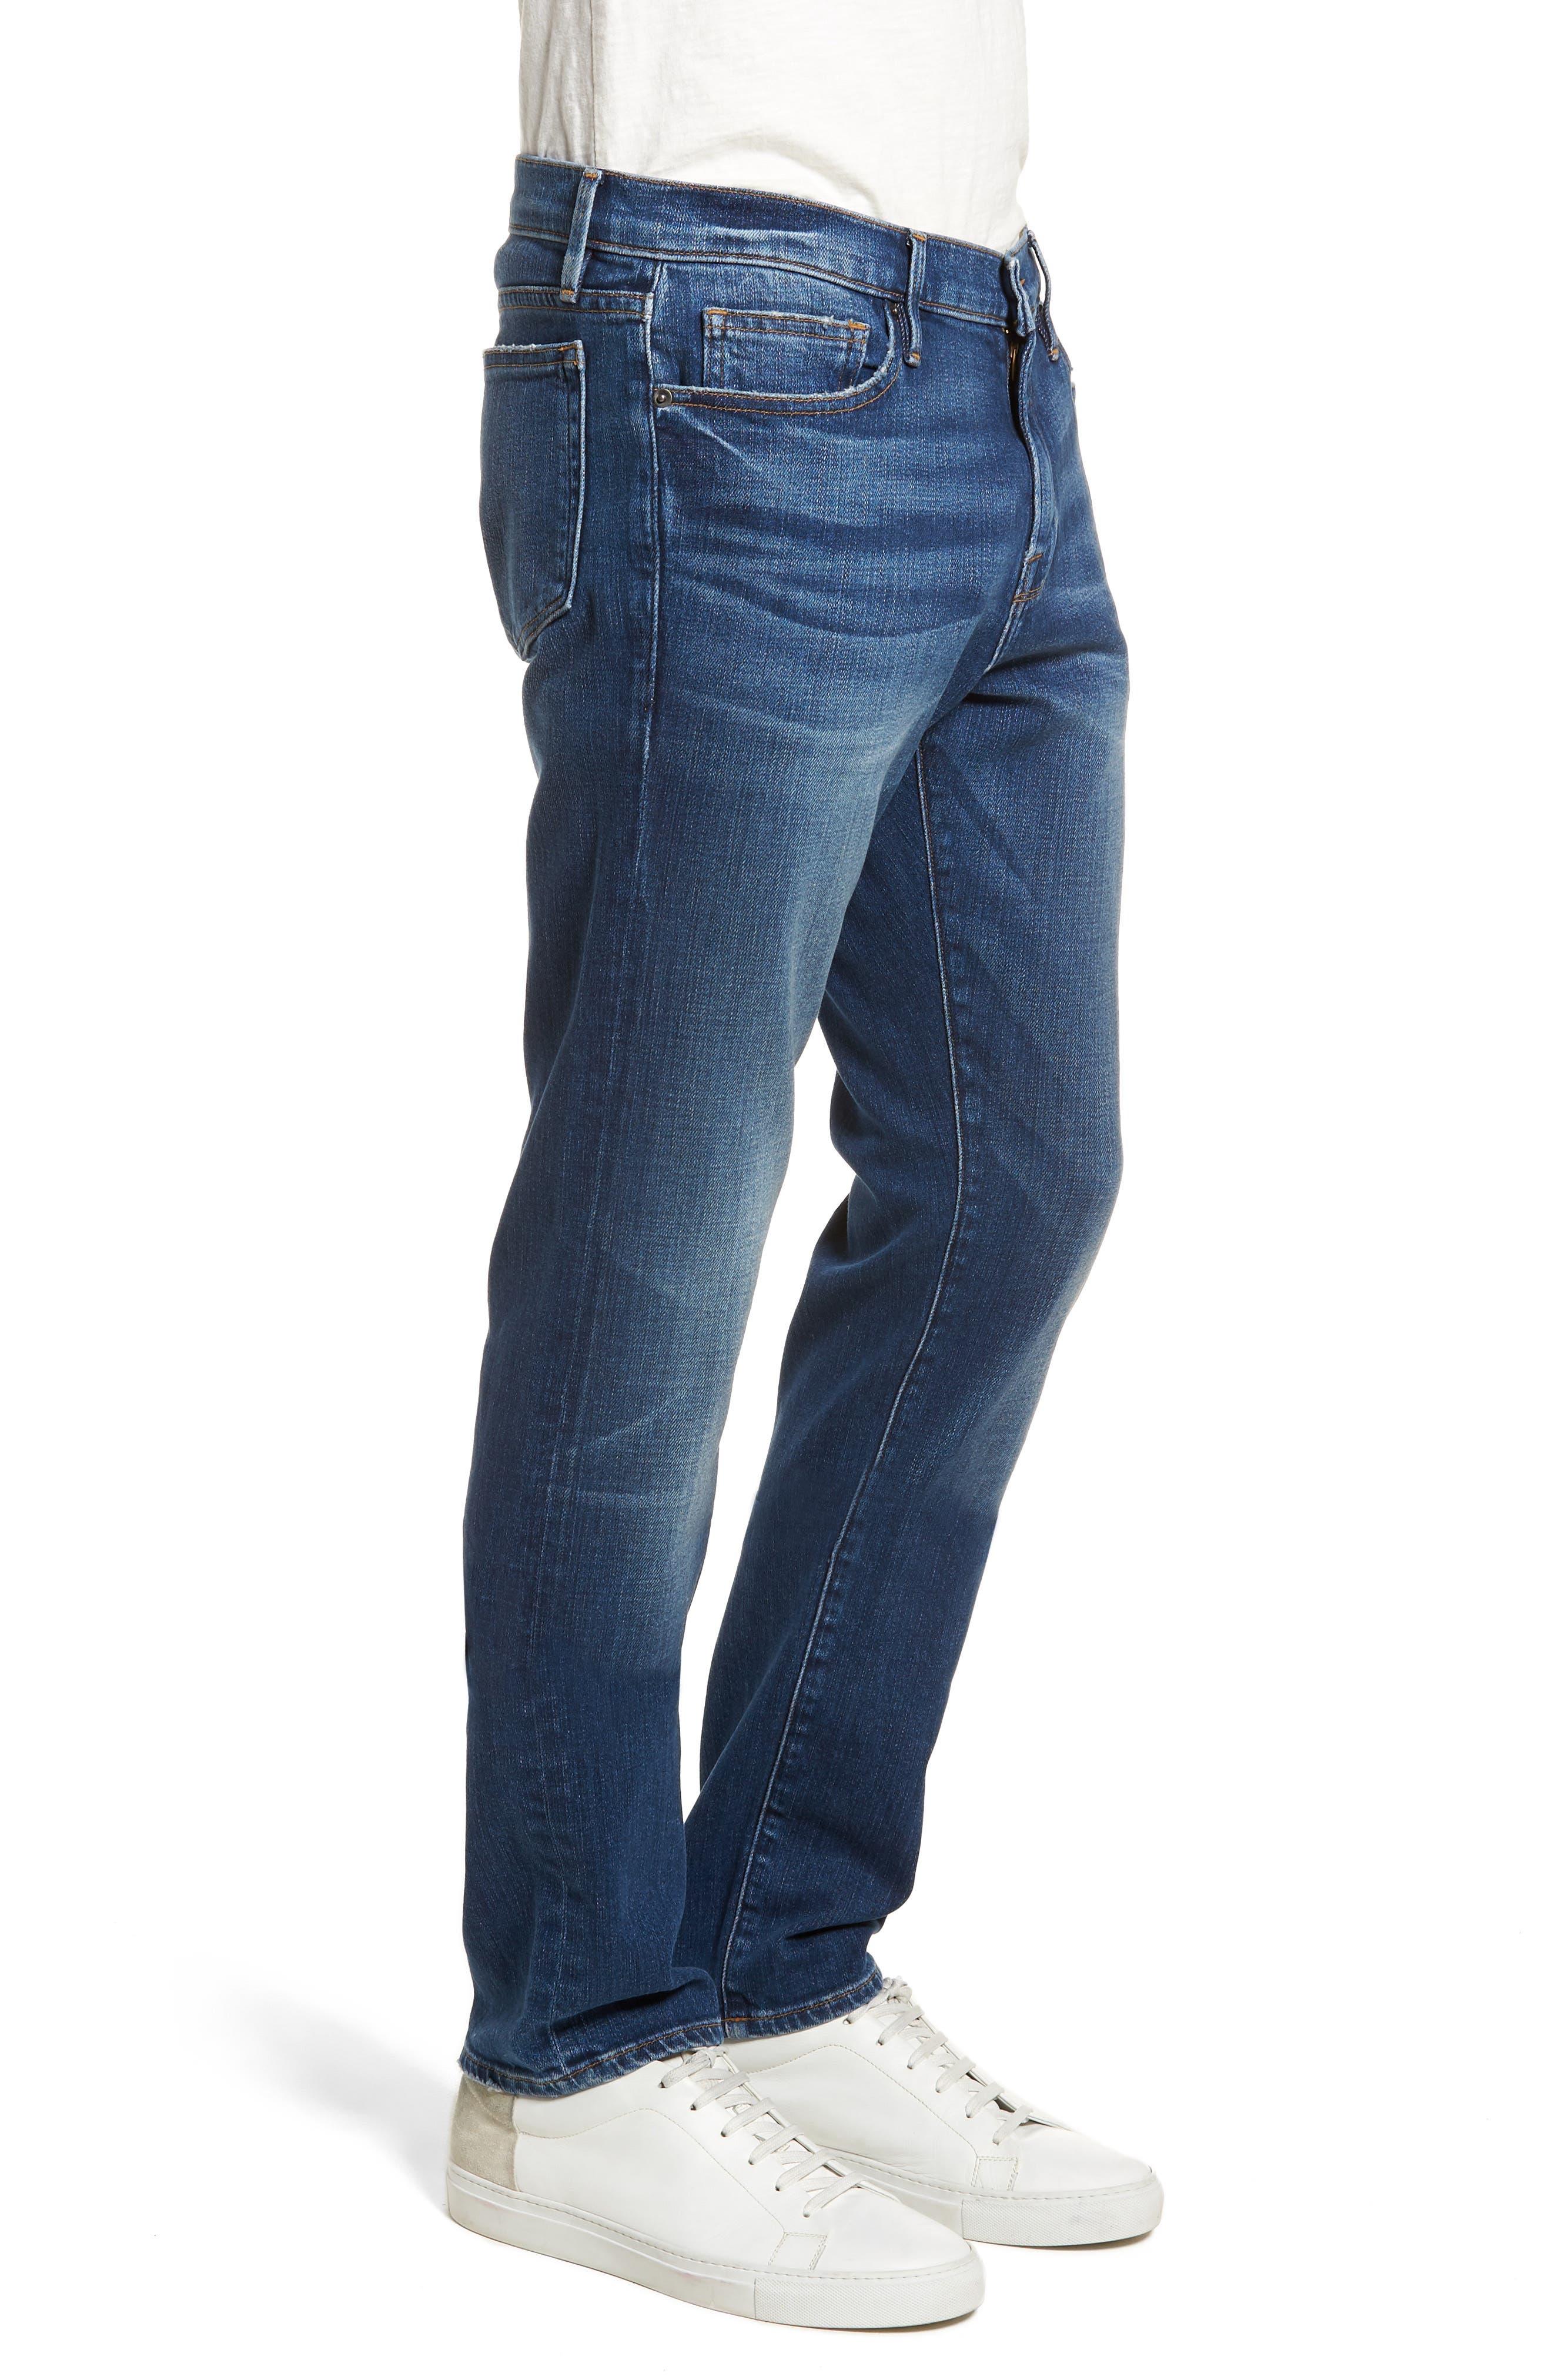 L'Homme Skinny Fit Jeans,                             Alternate thumbnail 3, color,                             420